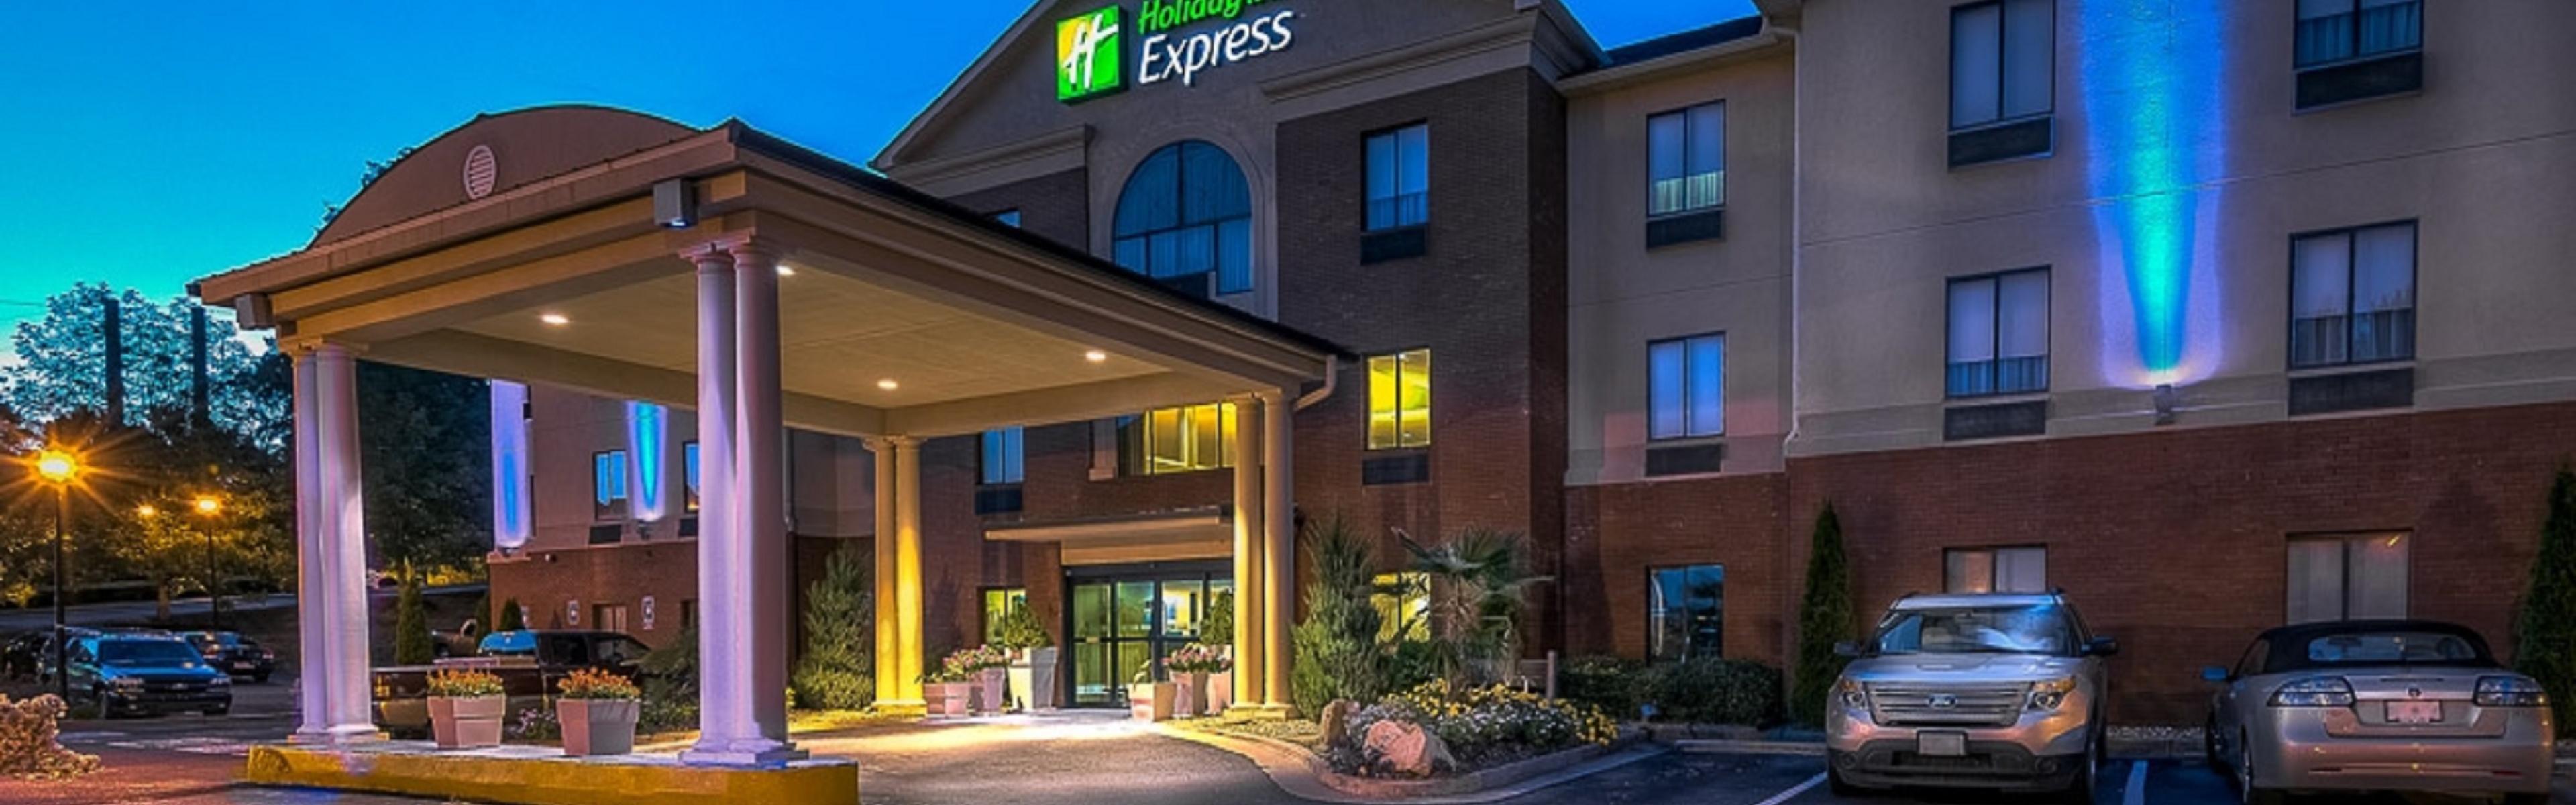 Holiday Inn Express Suites Canton Hotel Canton Ga 30114